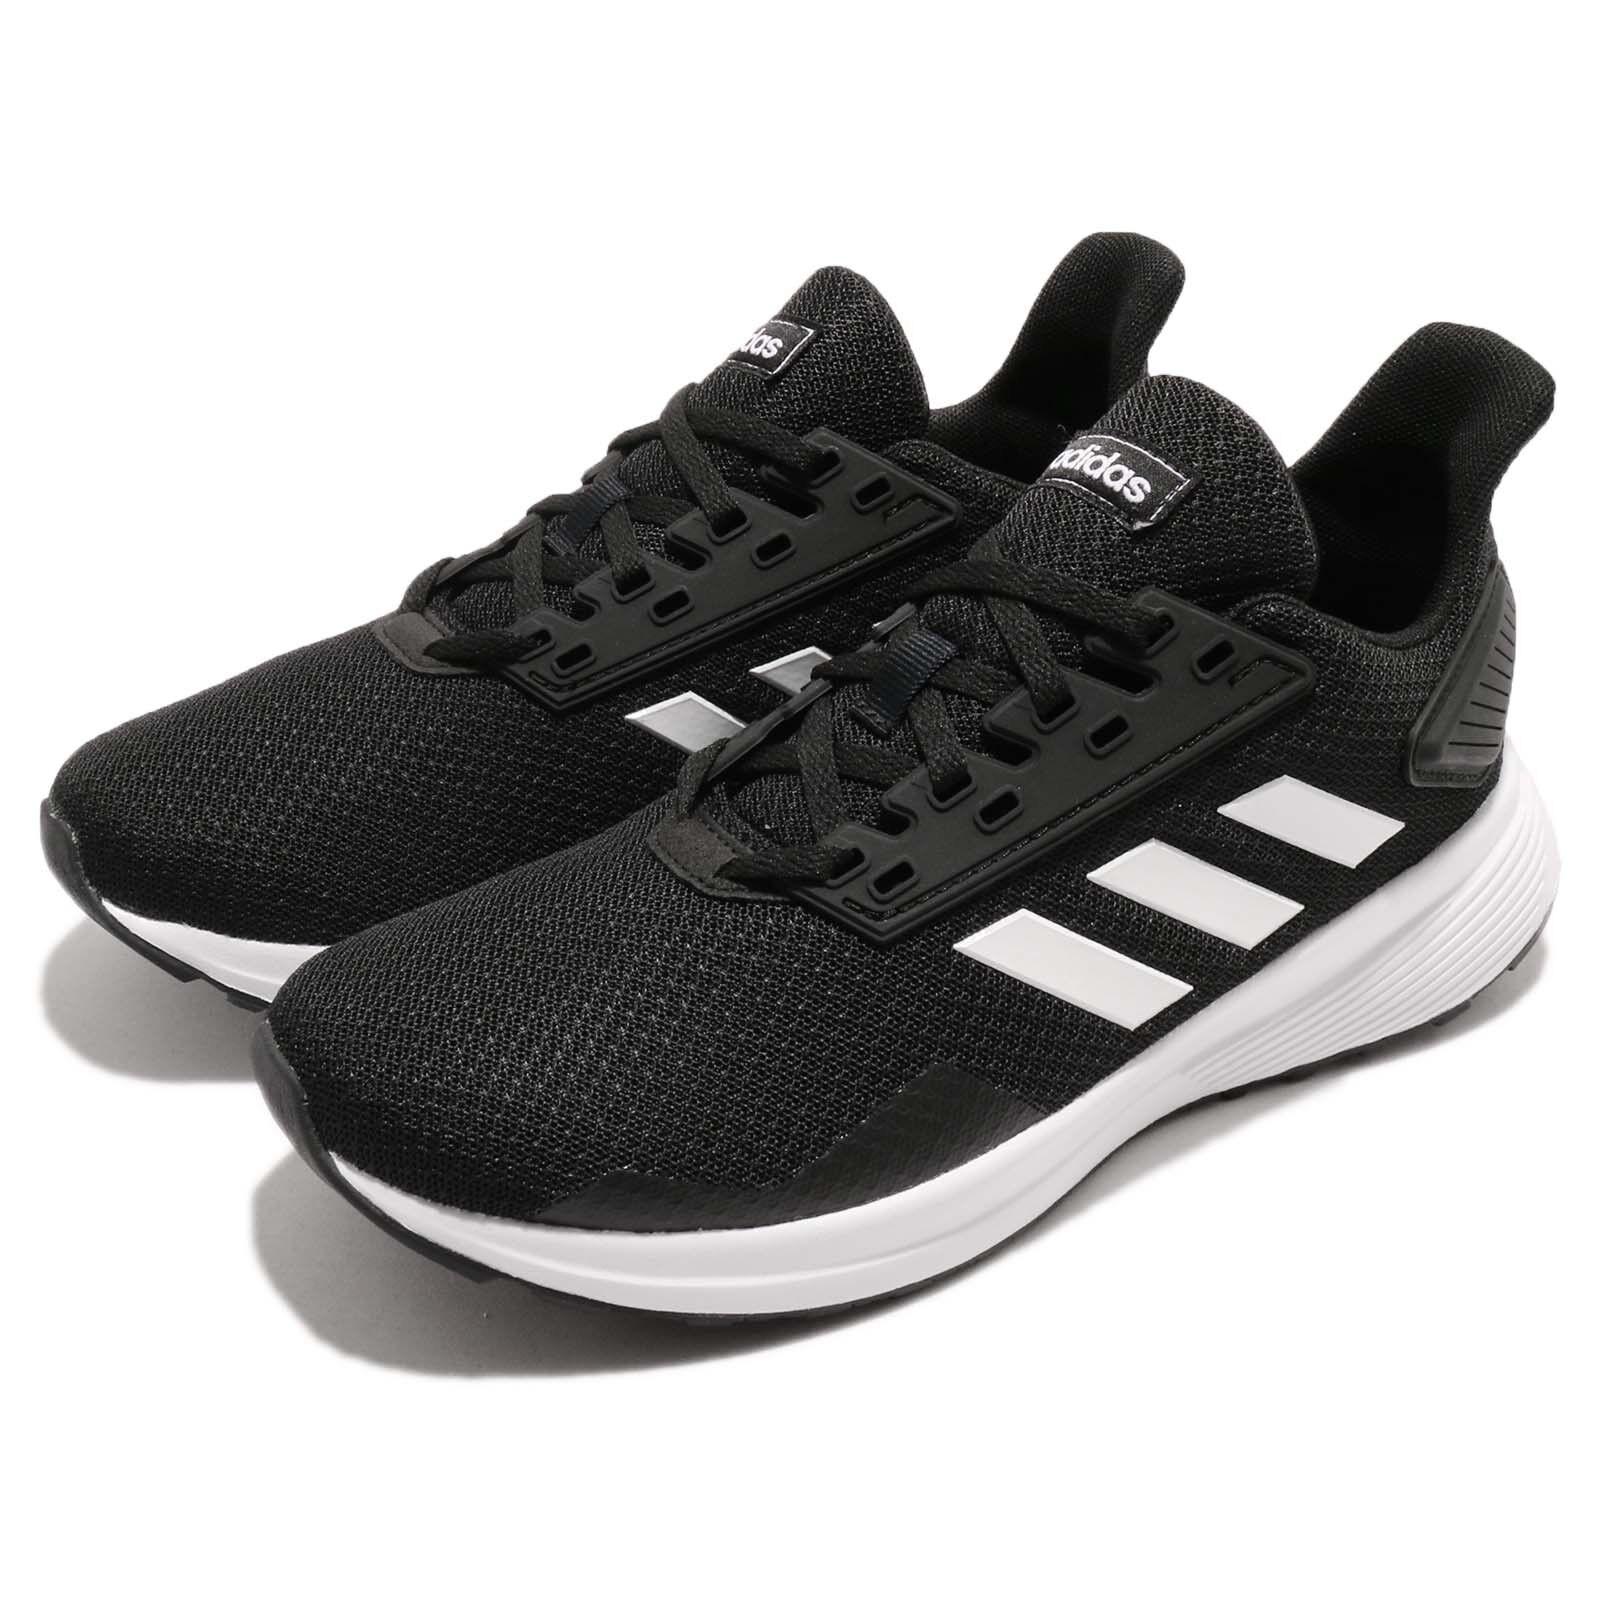 Adidas Duramo Duramo Adidas 9 K schwarz Weiß Schuhe Kid Youth Damens Running Schuhe 3b995e